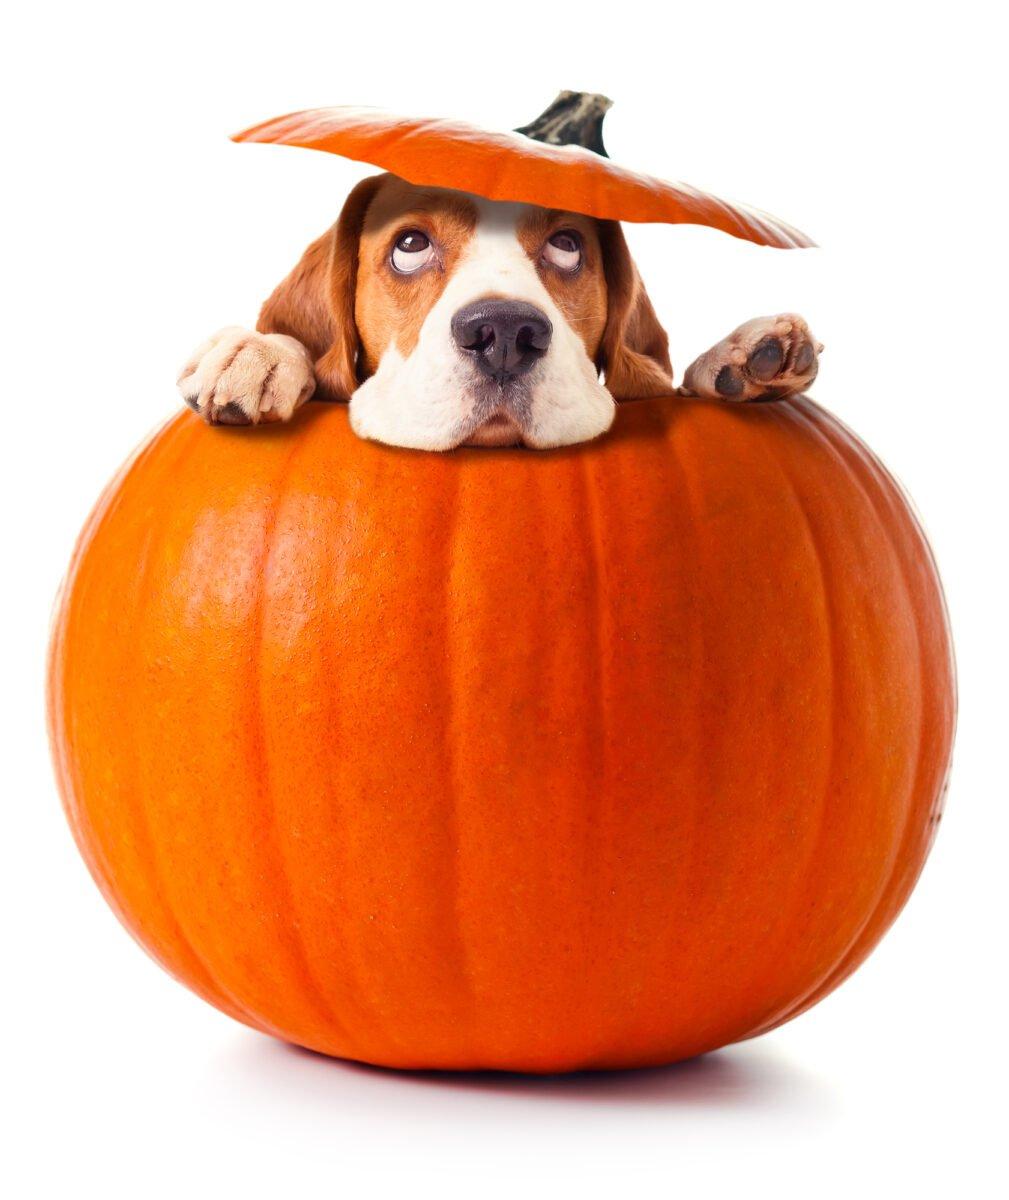 pumpkin carbs post image with dog inside of pumpkin